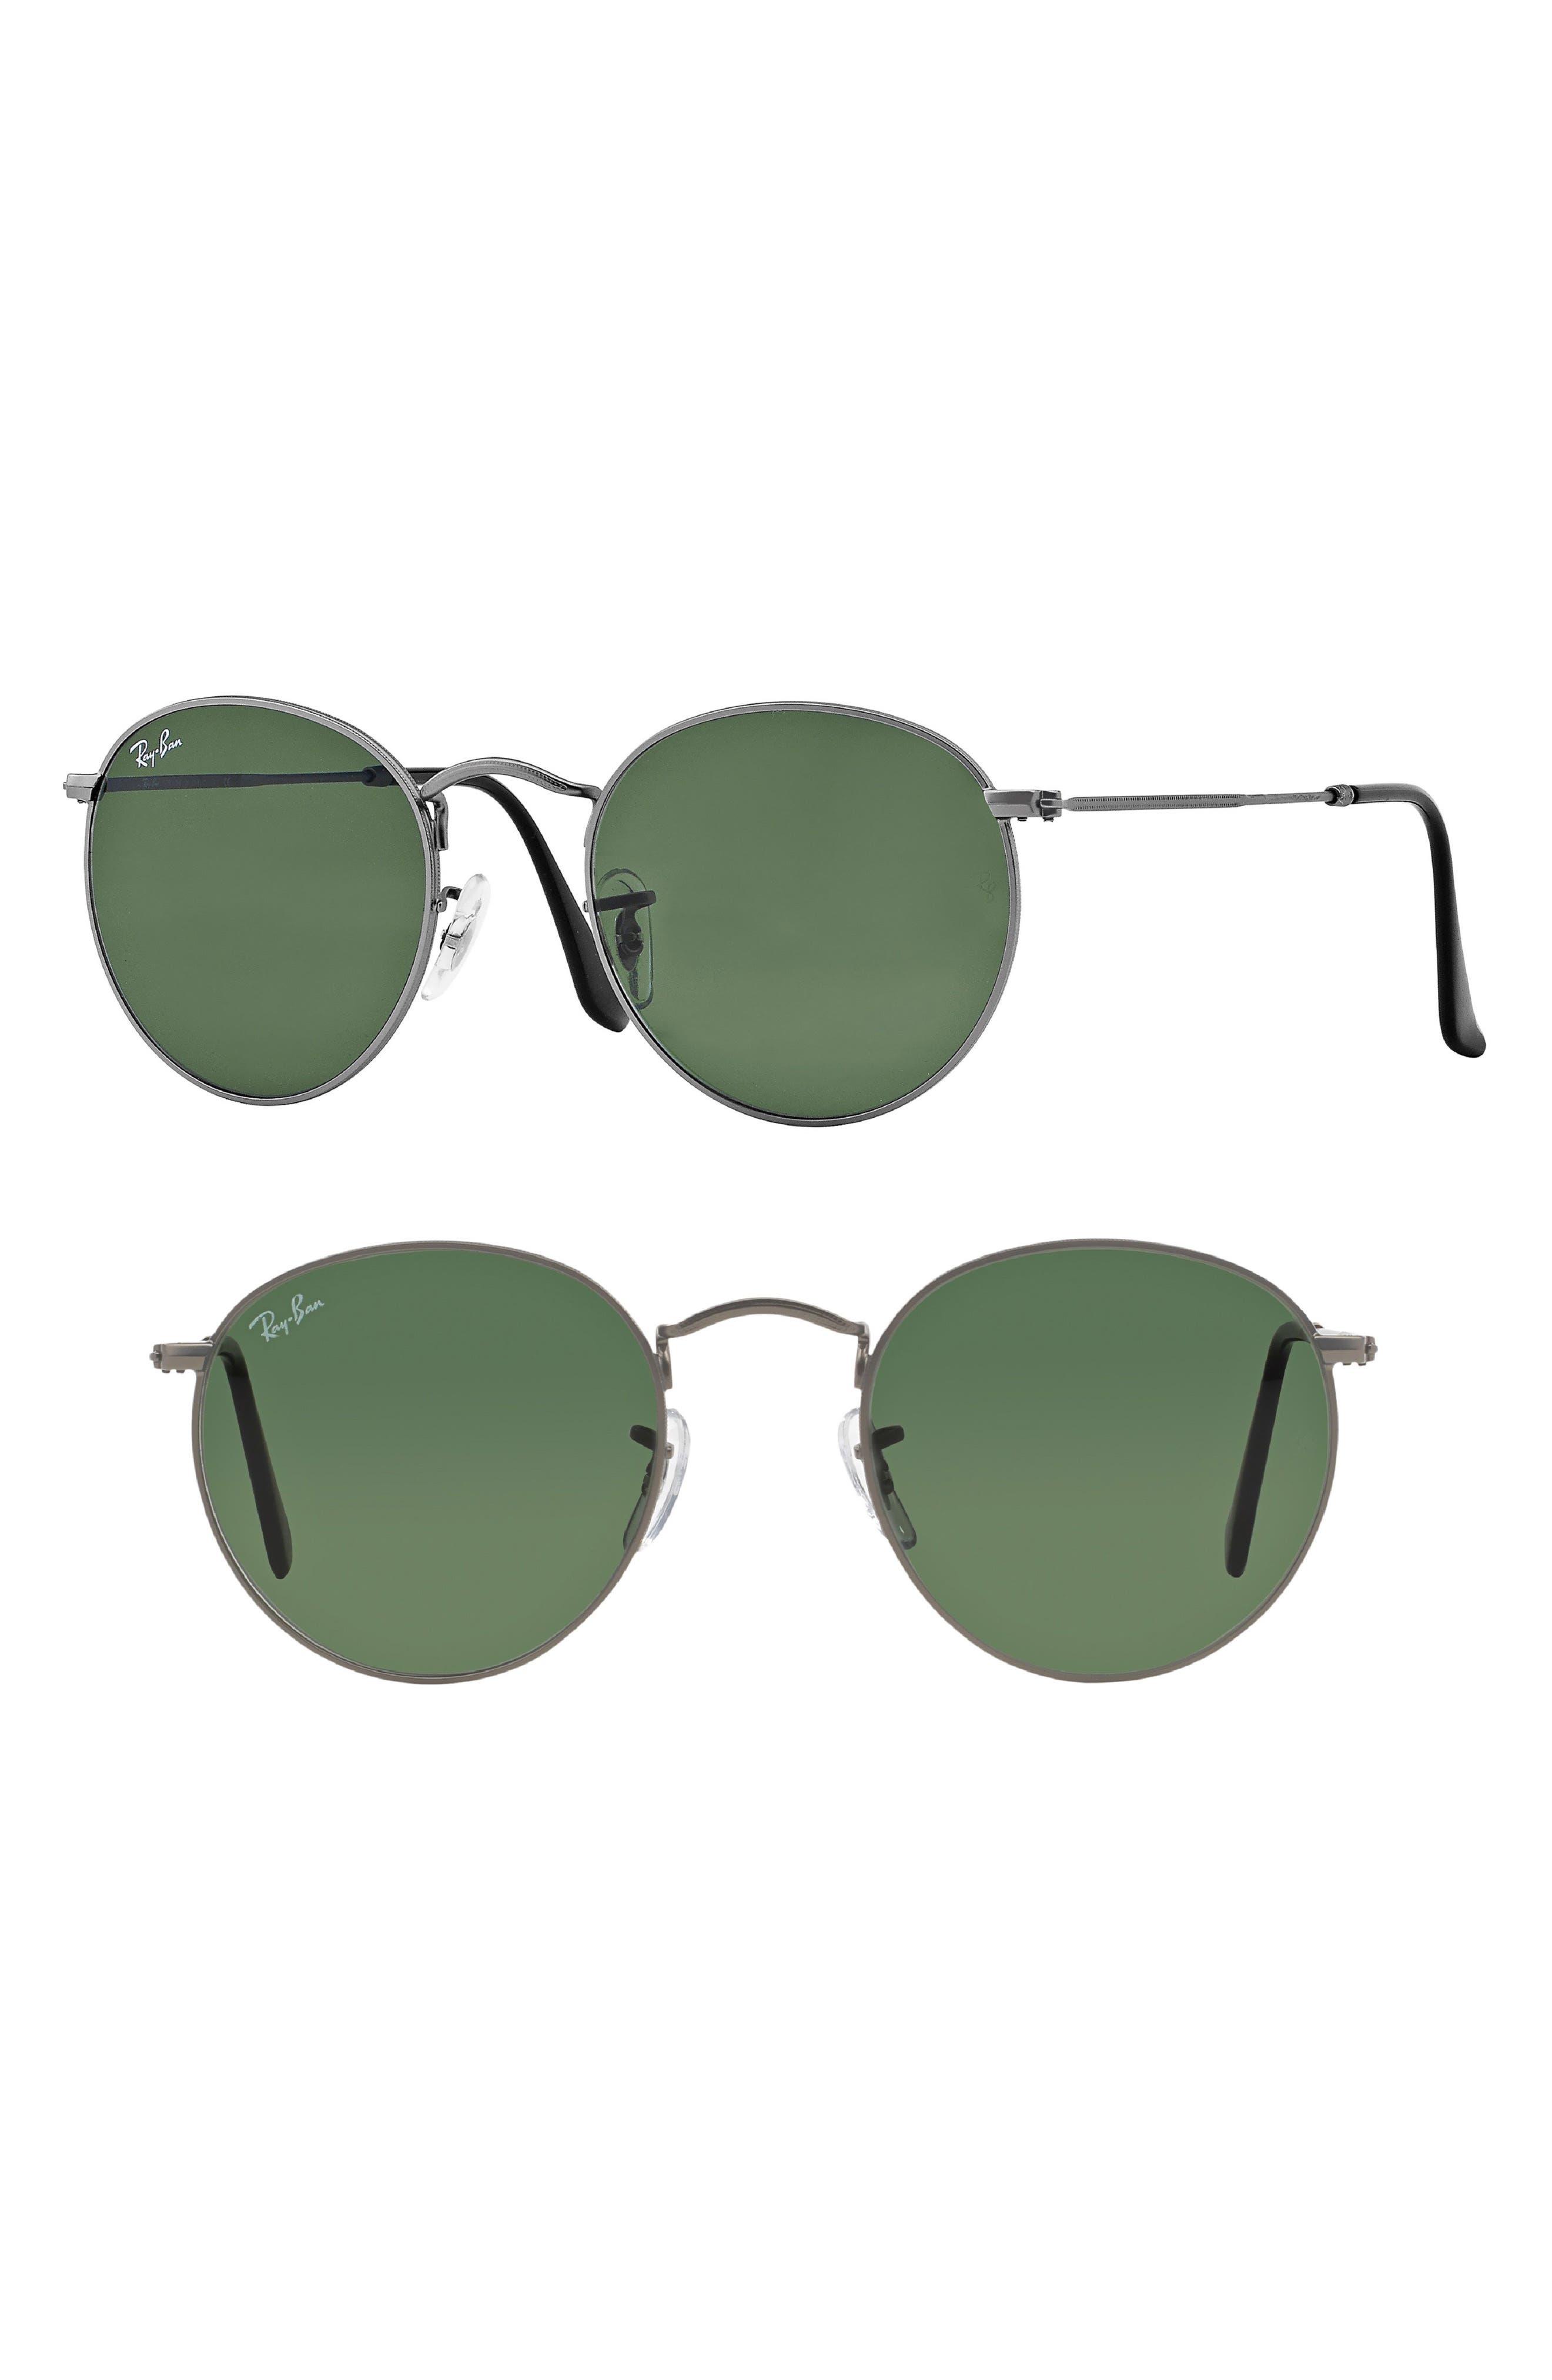 Icons 53mm Retro Sunglasses,                         Main,                         color, GUN/ GREEN SOLID